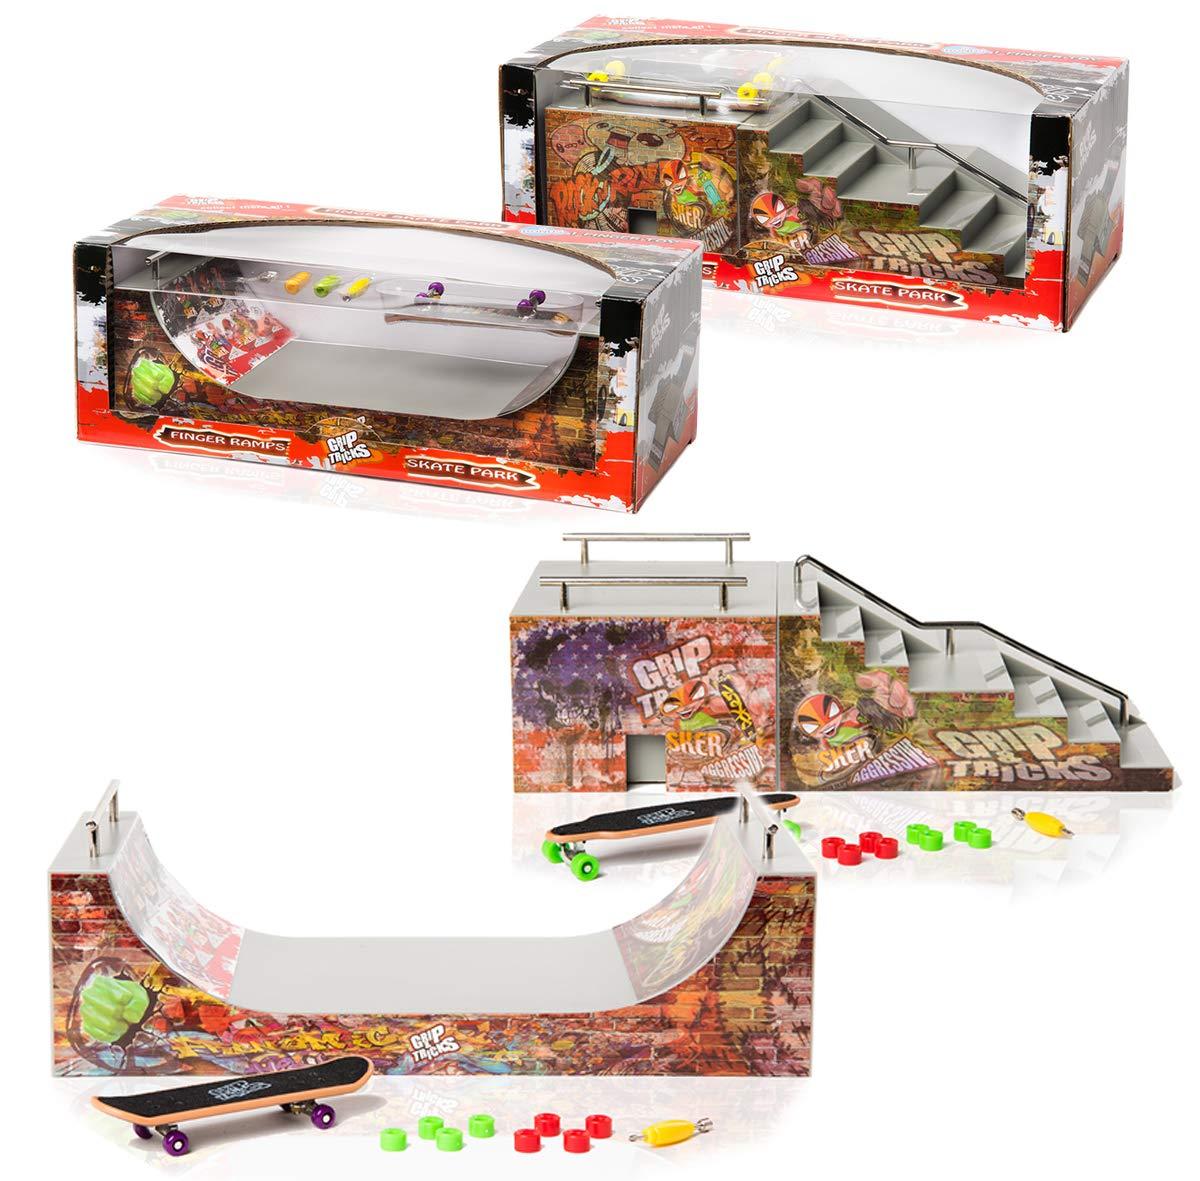 Finger Boards & Finger Bikes Toys & Games Halfpipe RAMPS for ...